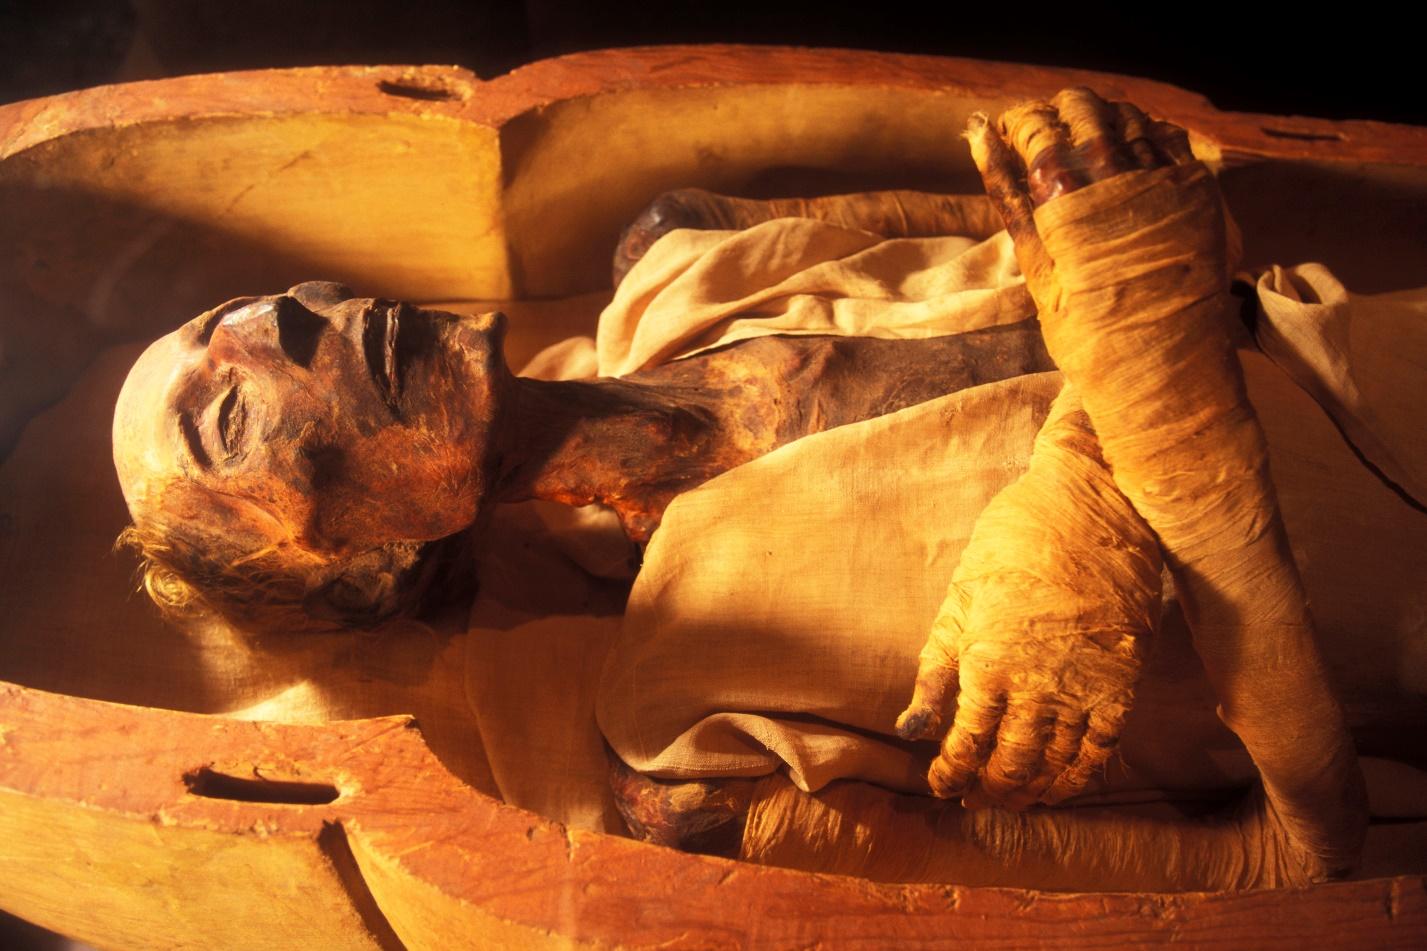 E:\Downloads\history-lists-5-great-mummy-discoveries-ramesses-ii.jpg